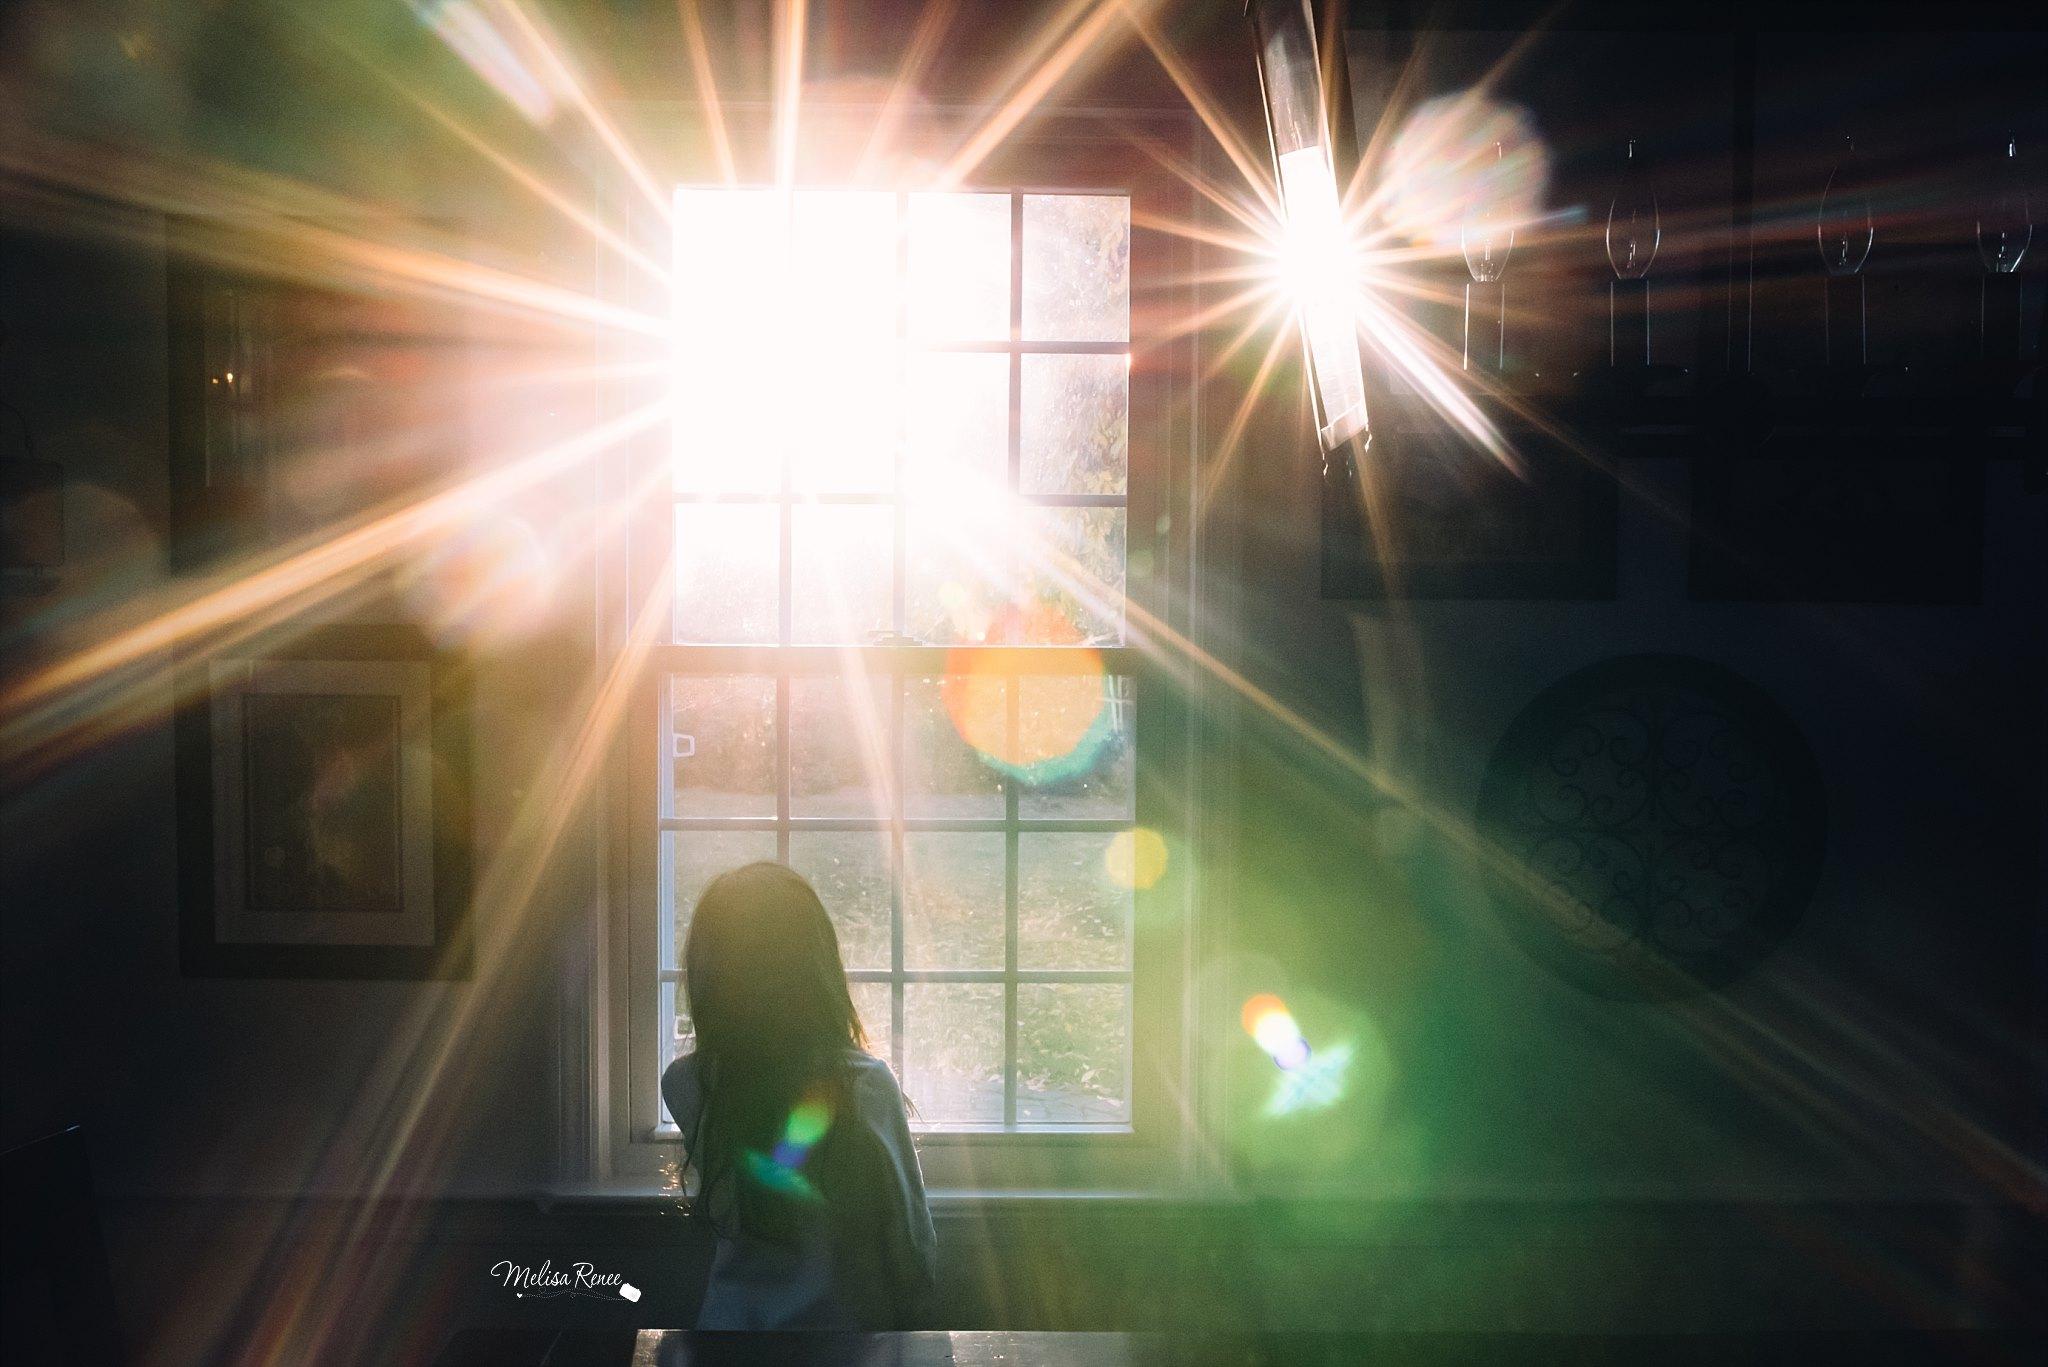 indoor light, daily fan favorite